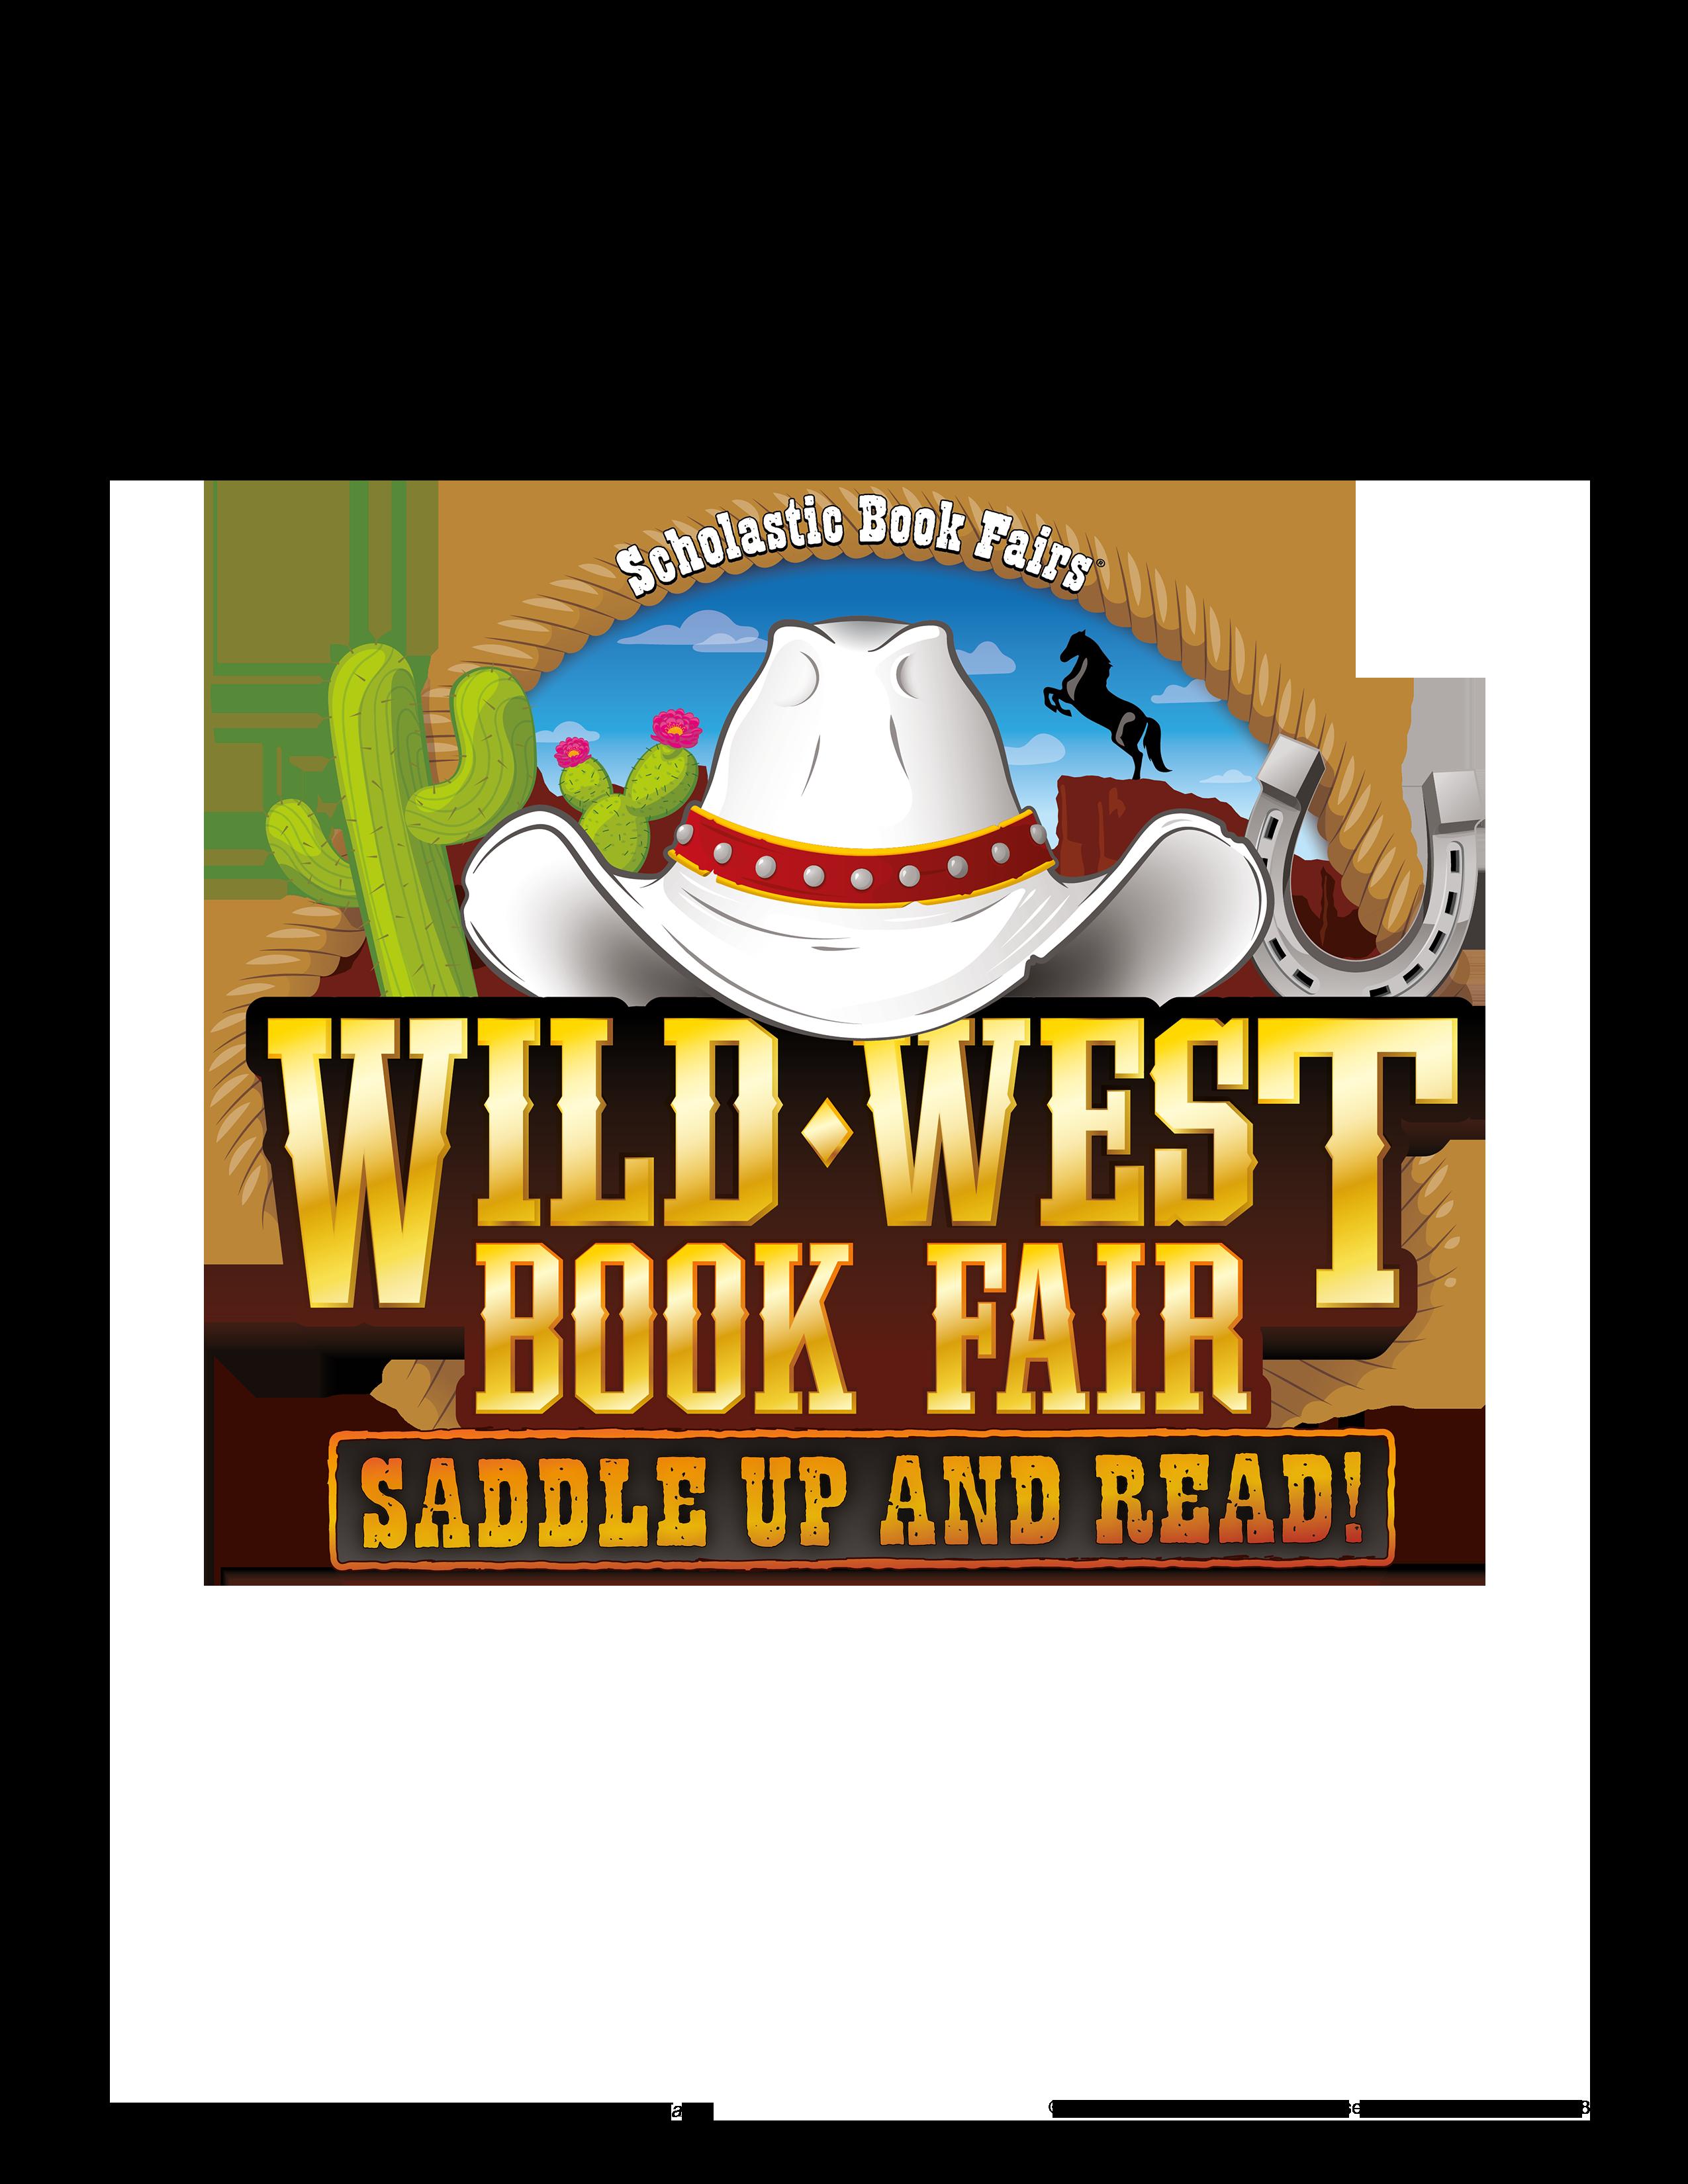 https://bookfairs.scholastic.com/bookfairs/cptoolkit/assetuploads/200018_wild_west_book_fair_clip_art_logo.png